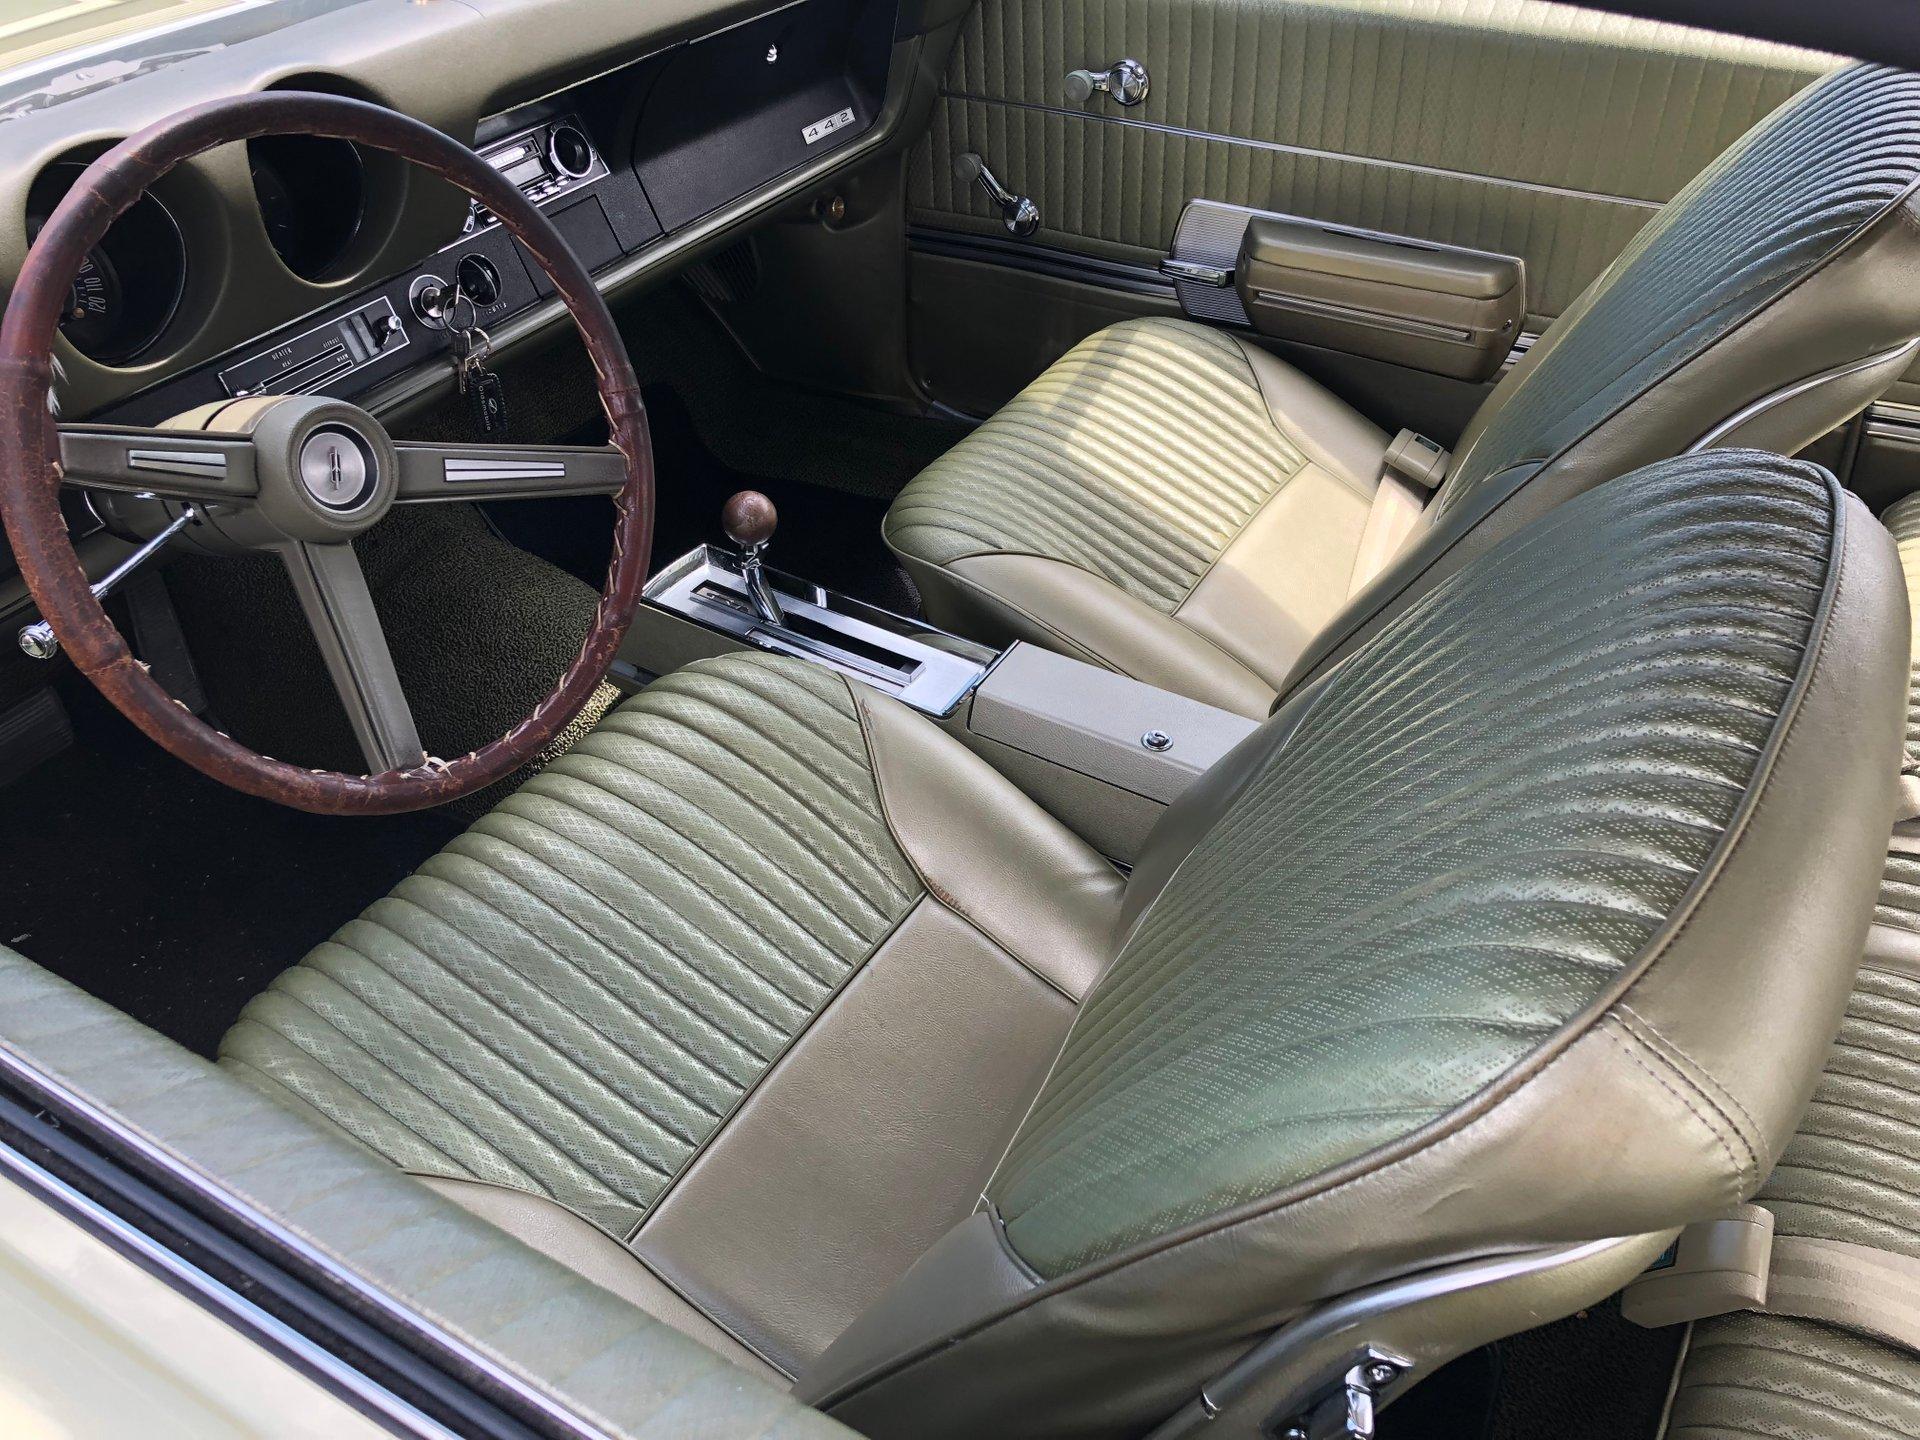 1968 Oldsmobile Cutlass 442 | Berlin Motors